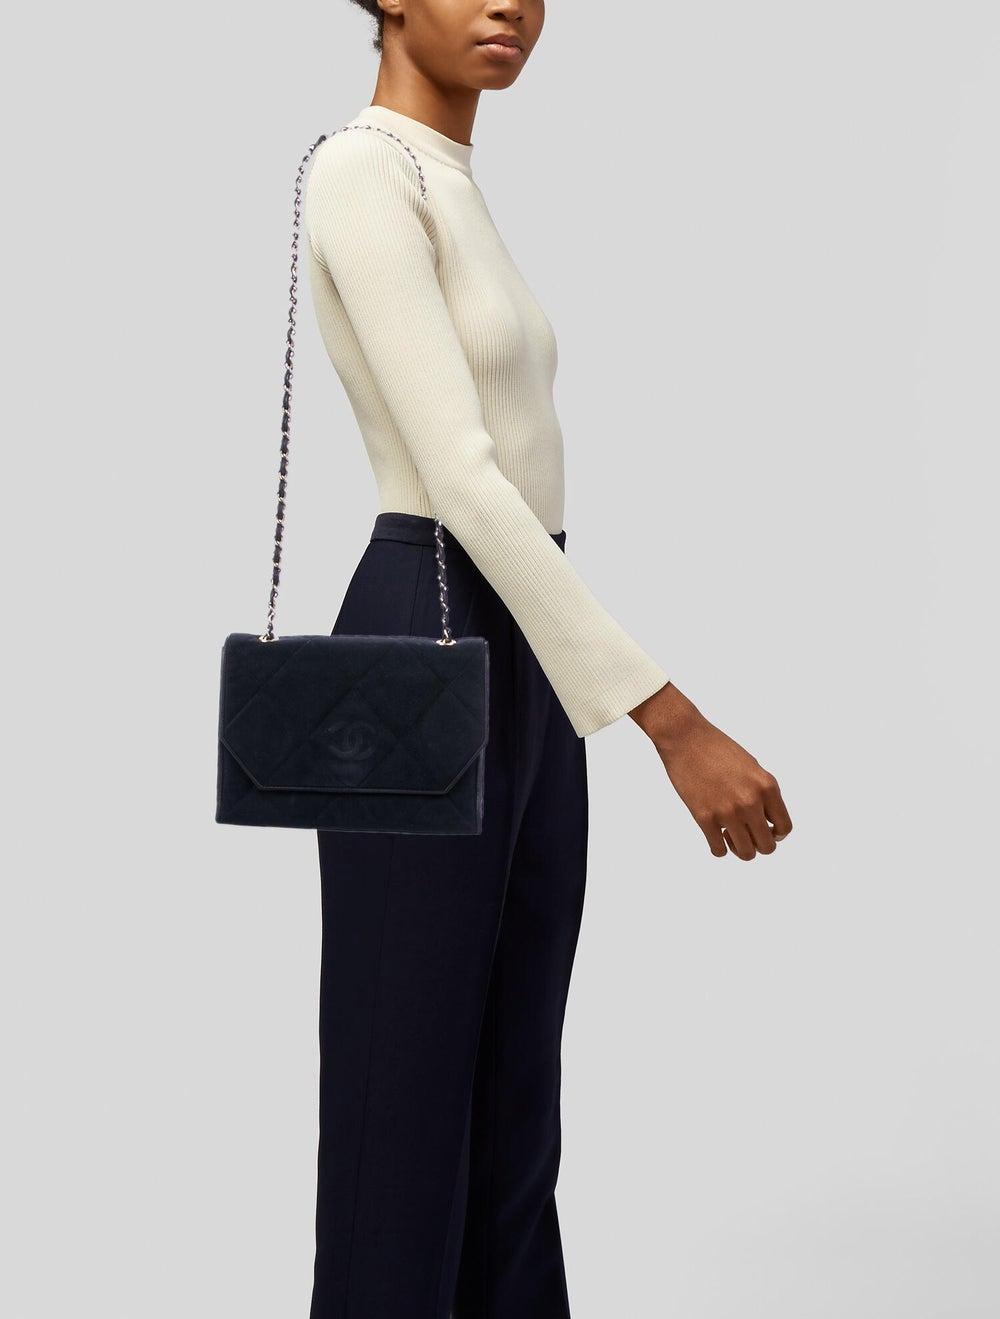 Chanel Vintage Quilted CC Flap Bag Blue - image 2